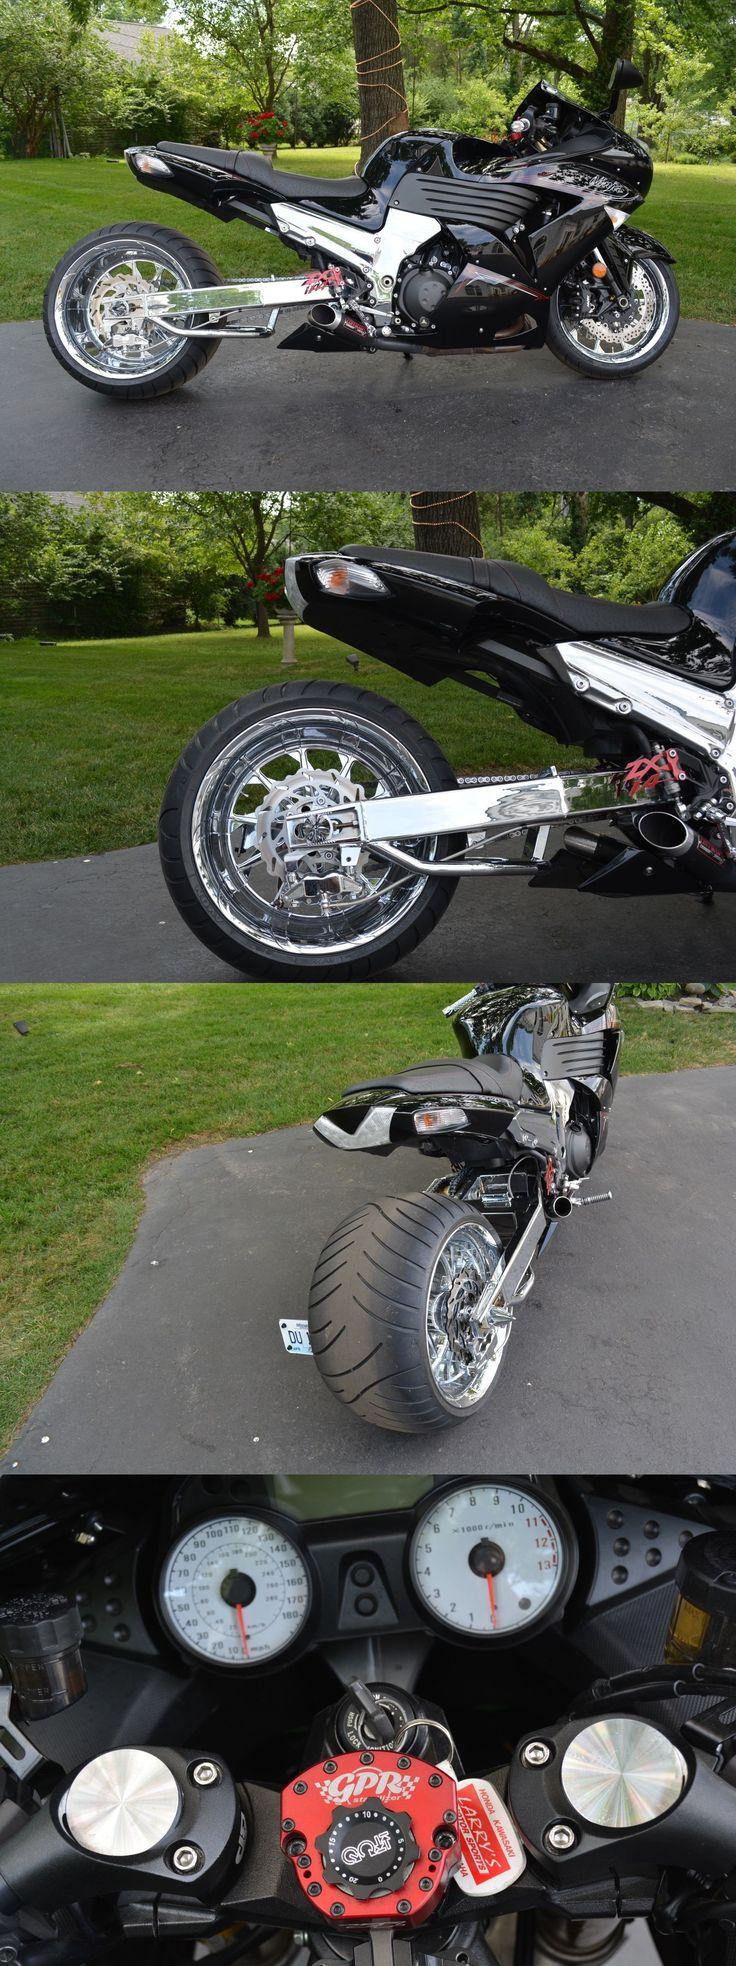 Motorcycles: 2011 Kawasaki Ninja 2011Kawasaki Ninja 1400 330 Fat Tire Bike -> BUY IT NOW ONLY: $14900 on eBay!